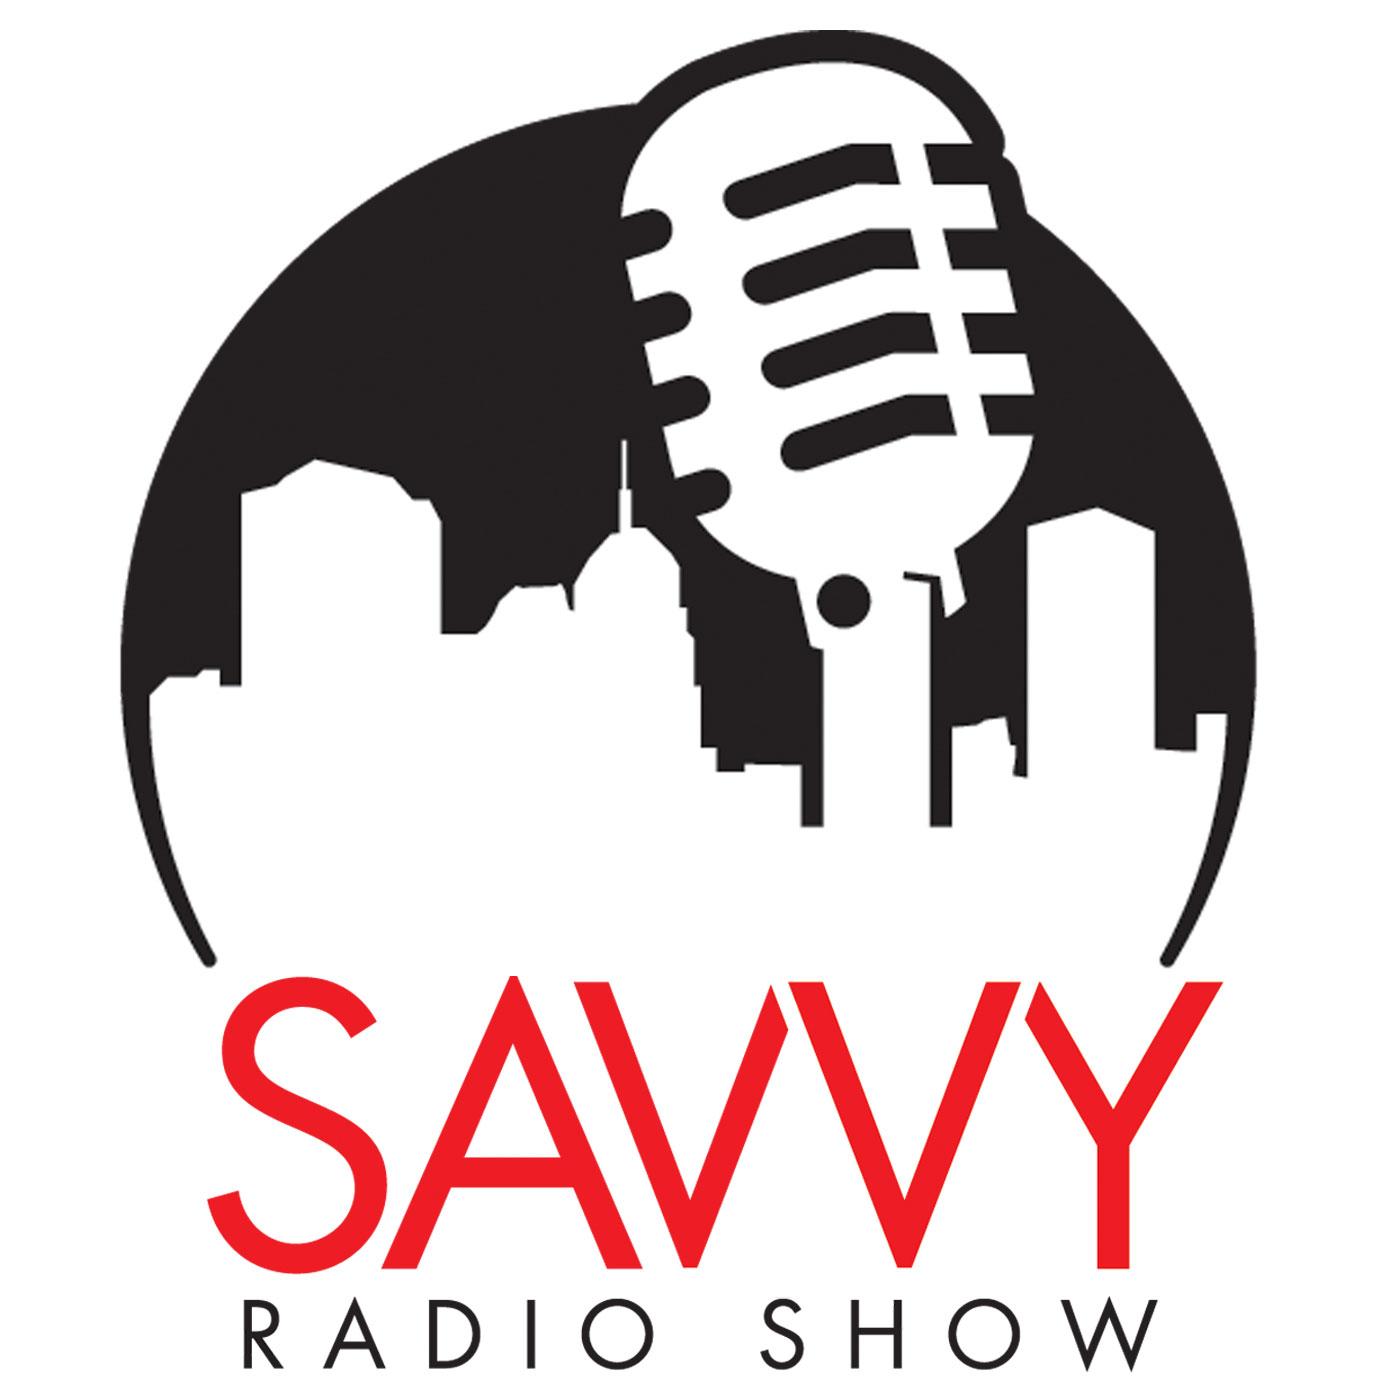 Savvy Radio Show show art